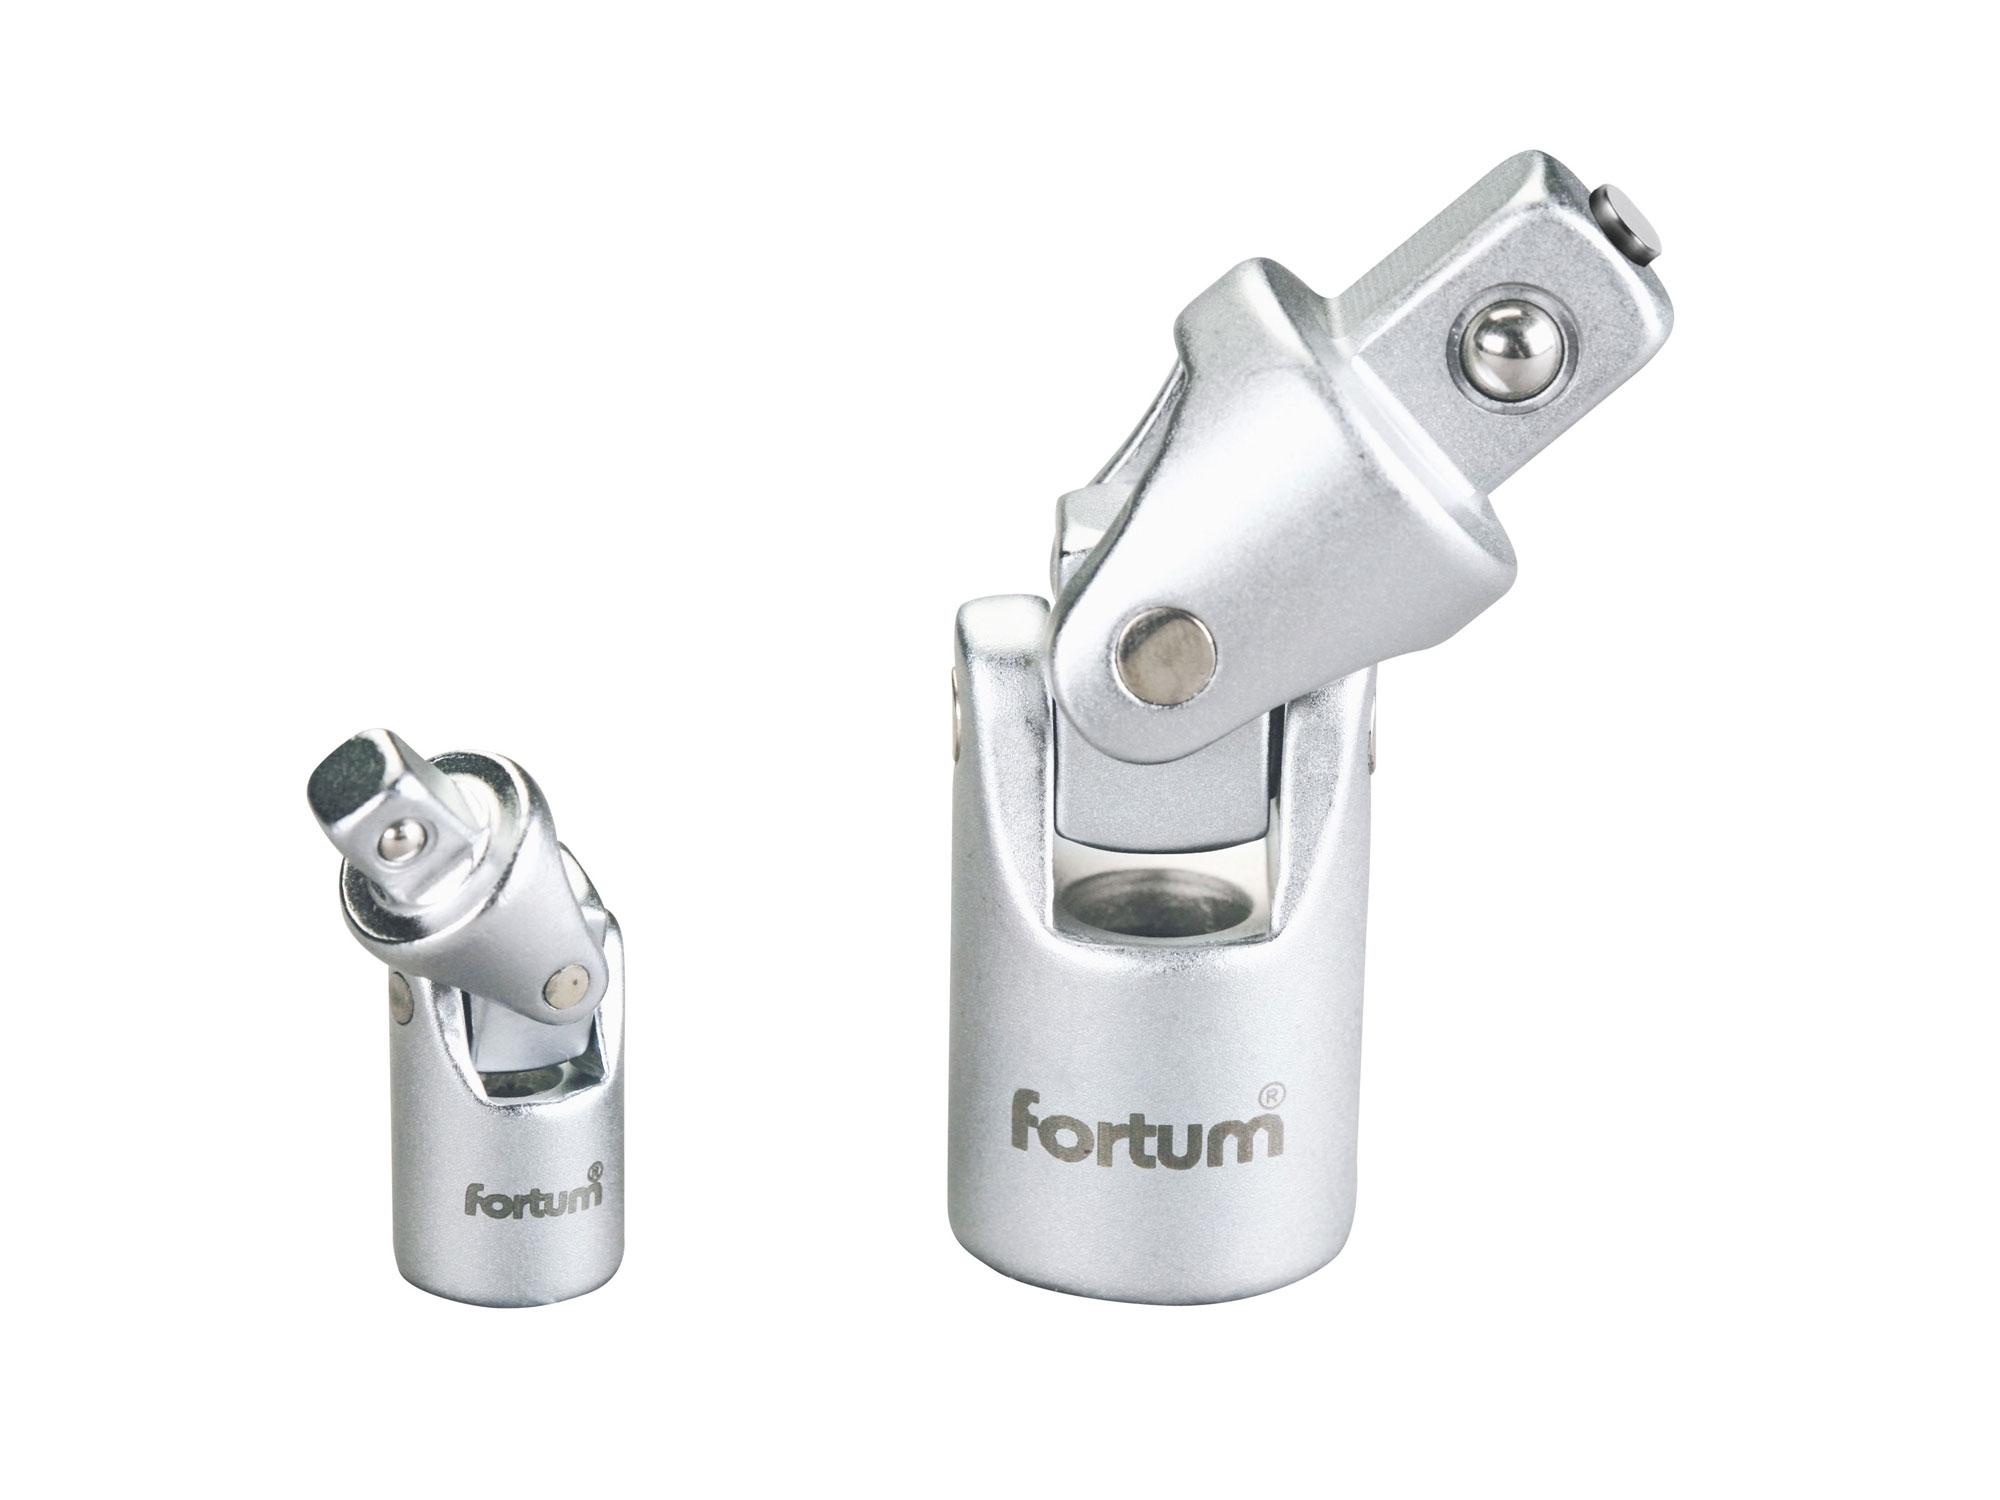 "kardan univerzální, 1/2"", L 71mm, s magnetem, FORTUM 4700912"